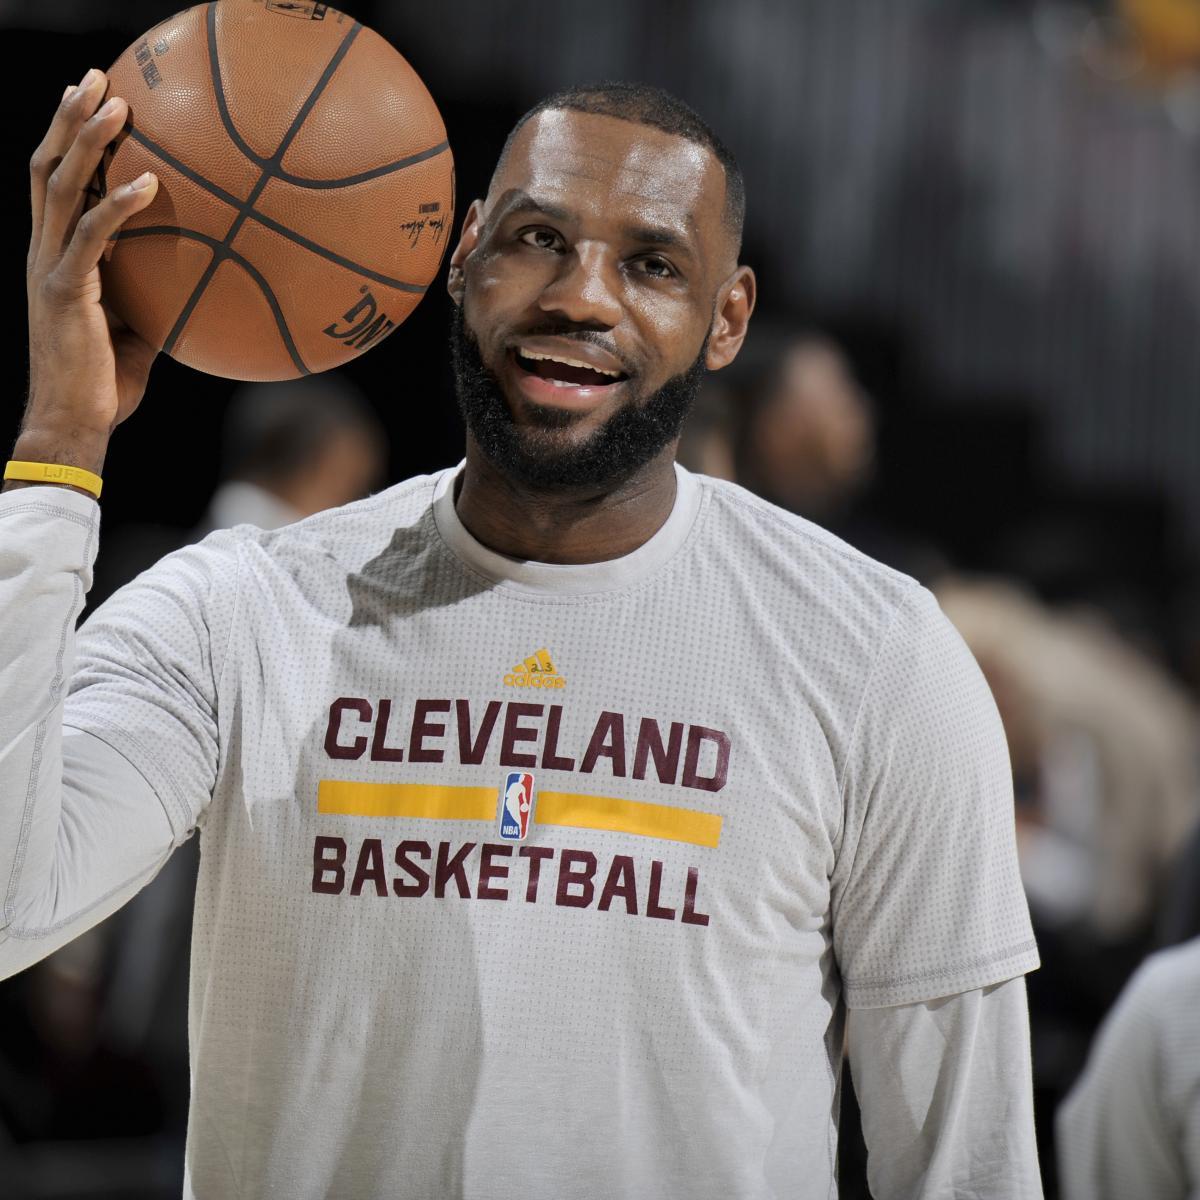 LeBron James, Cavaliers Teammates Attend Michigan vs. Ohio State